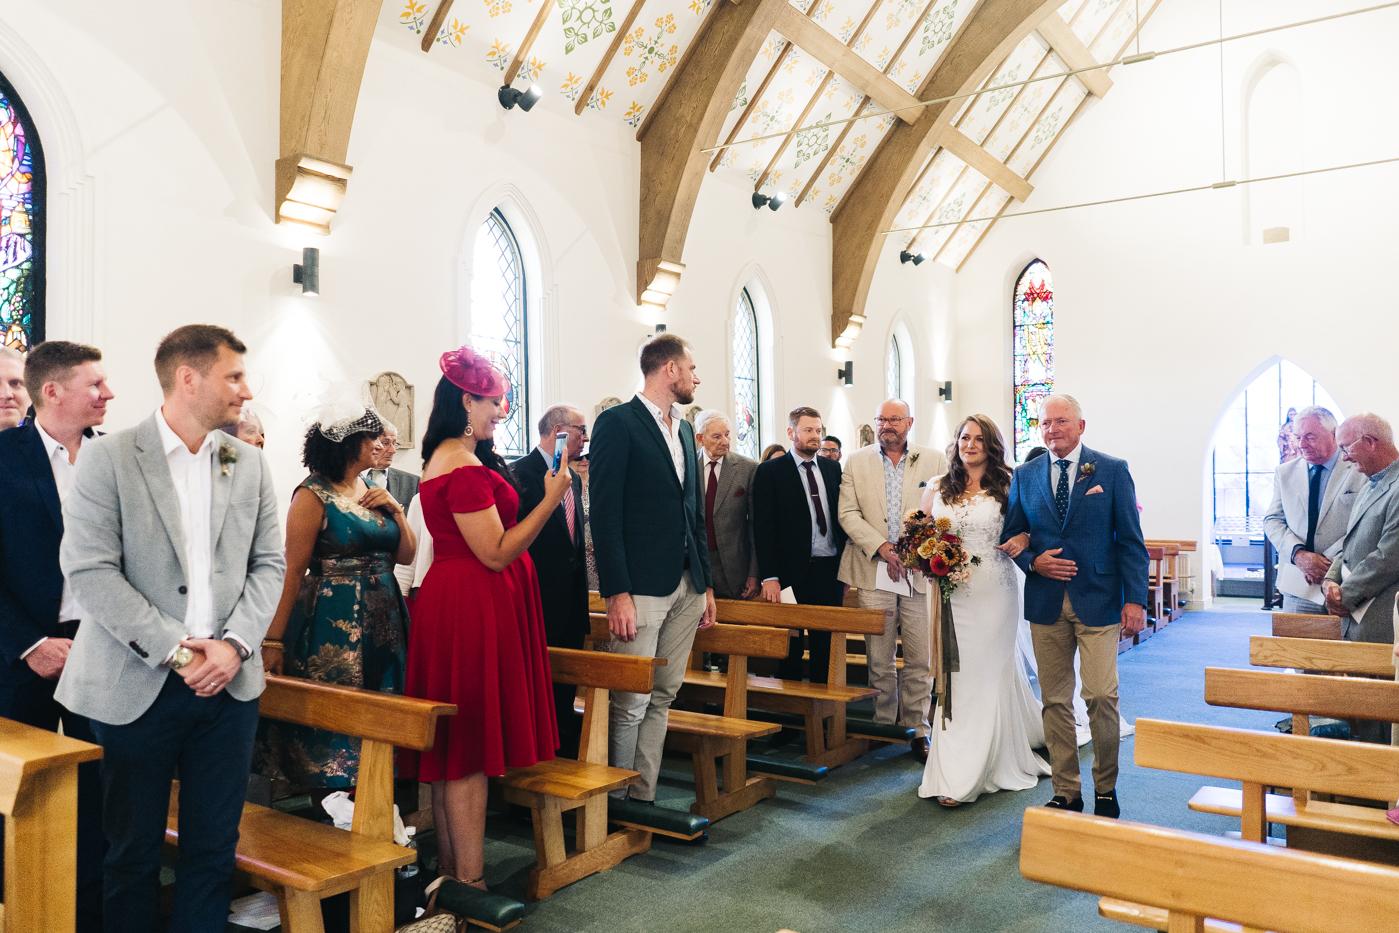 wedding-at-the-pheasant-harome-helmsley-north-yorkshire-wedding-photographer-0014.jpg